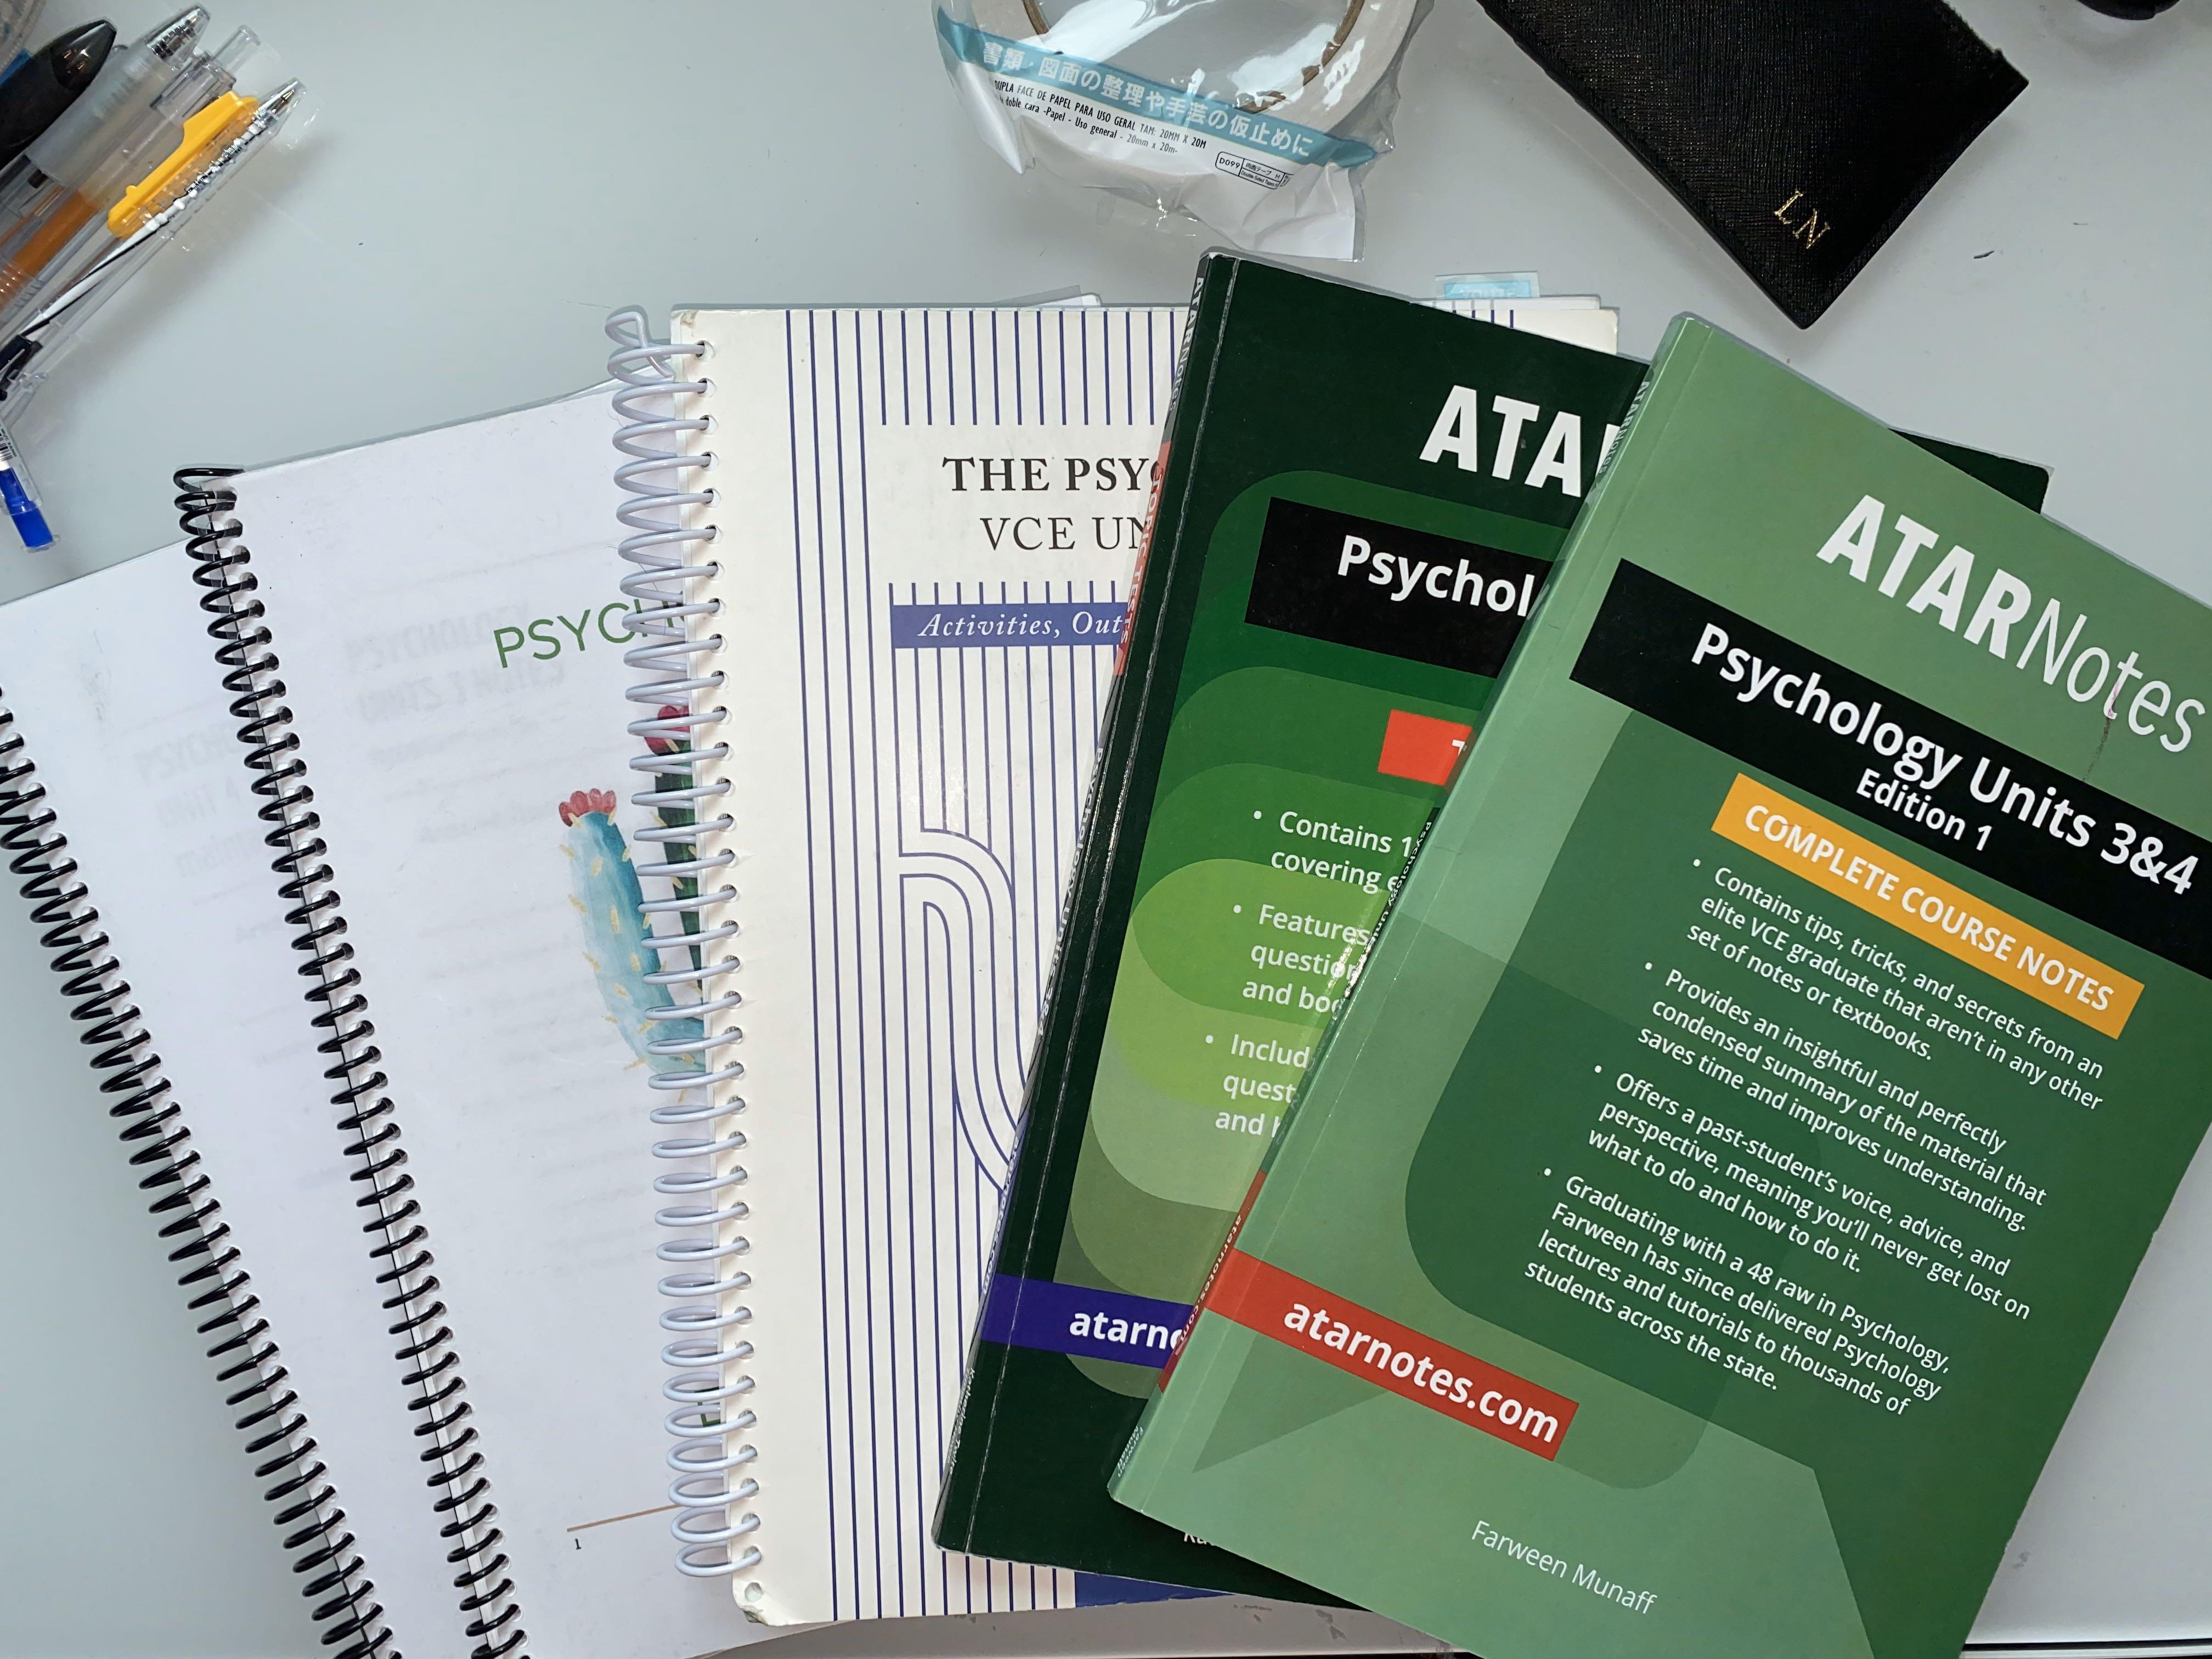 U3/4 Psychology  atar notes, spiral workbook, notes